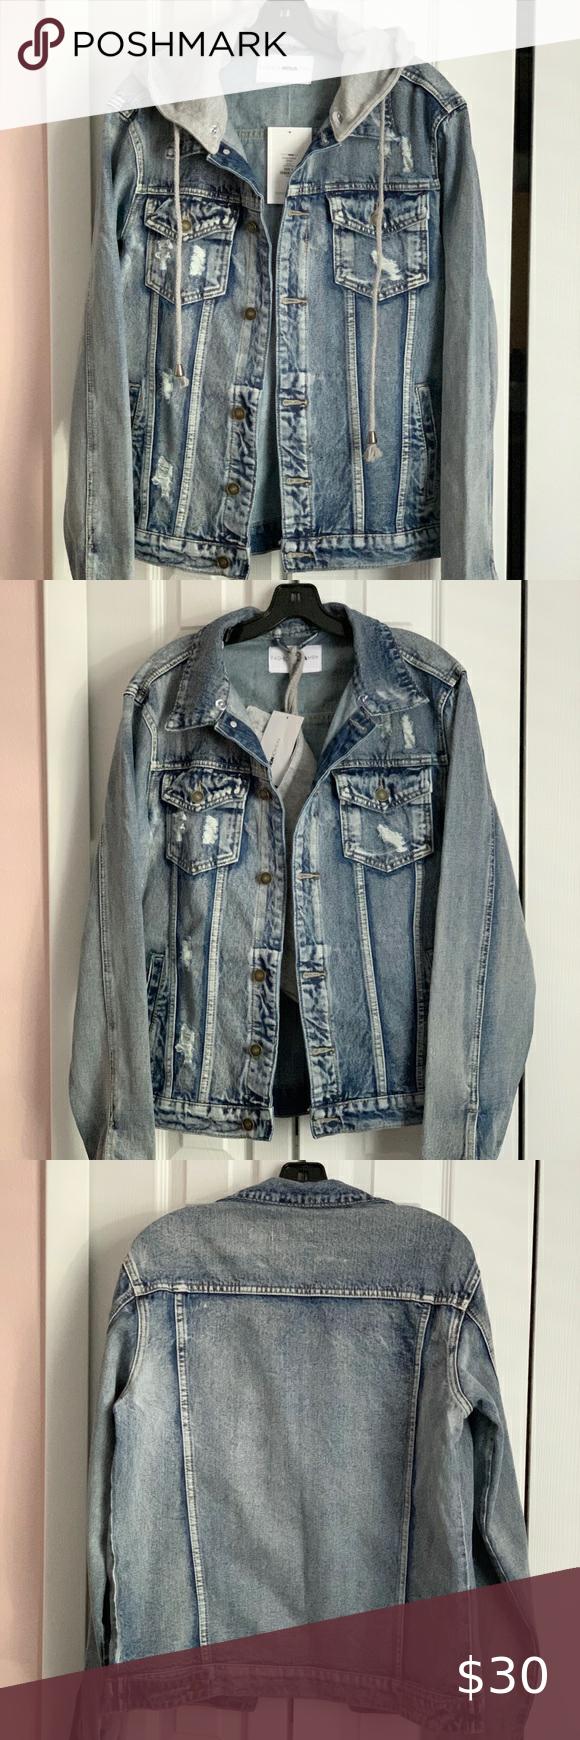 Men S Jean Jacket Denim Jacket Fashion Denim Jacket Men Denim Jacket [ 1740 x 580 Pixel ]